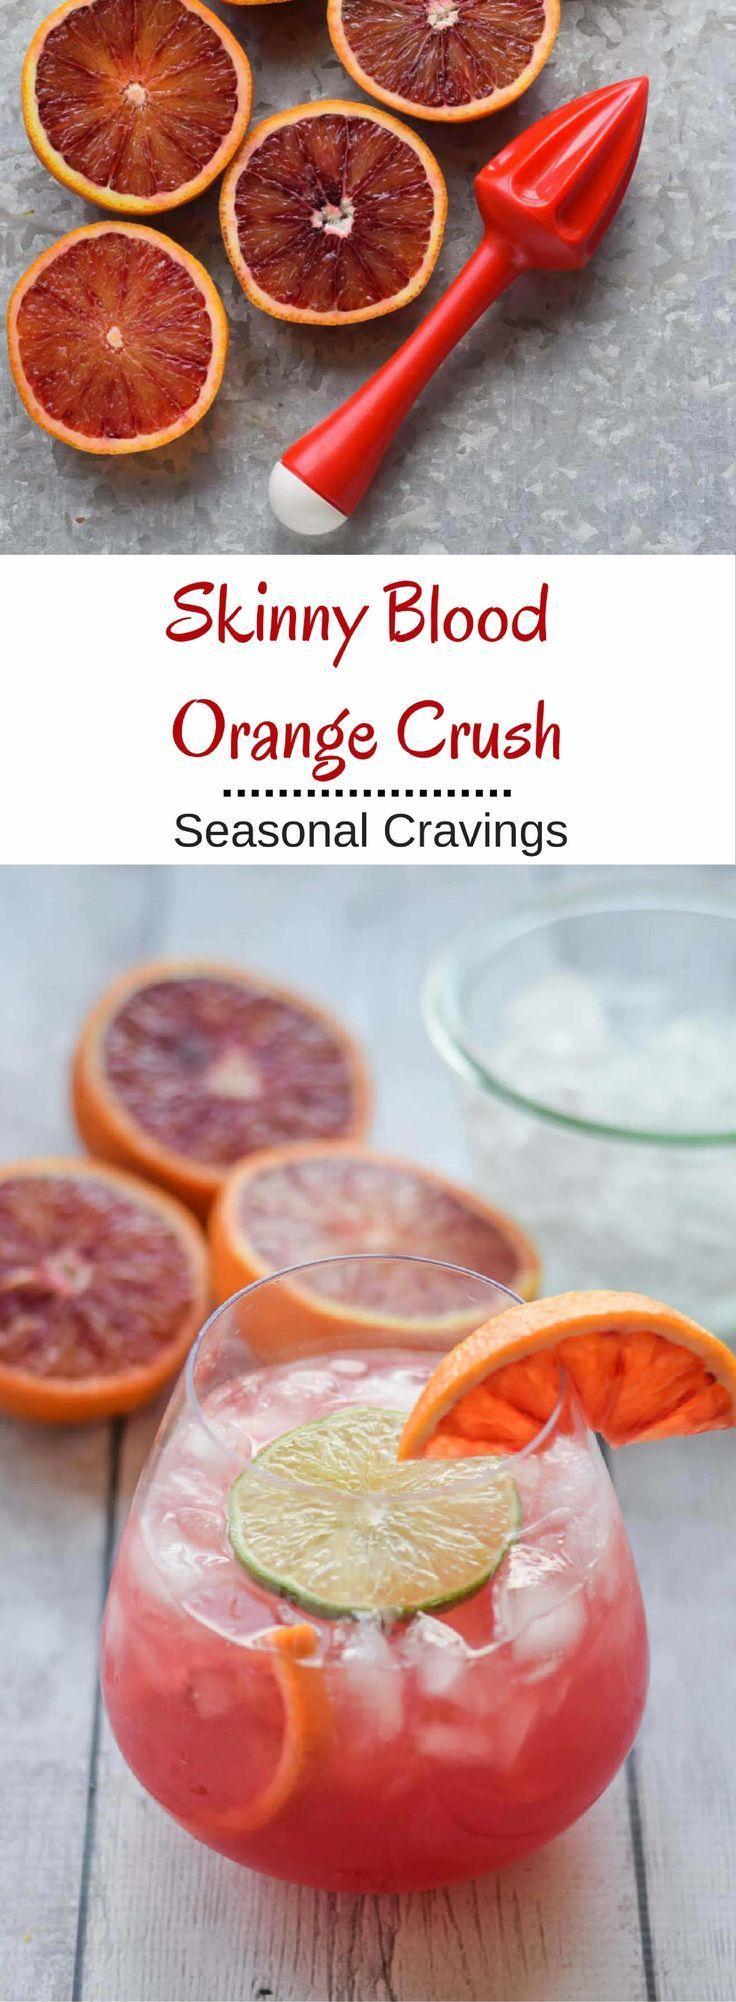 Wedding - Skinny Blood Orange Crush